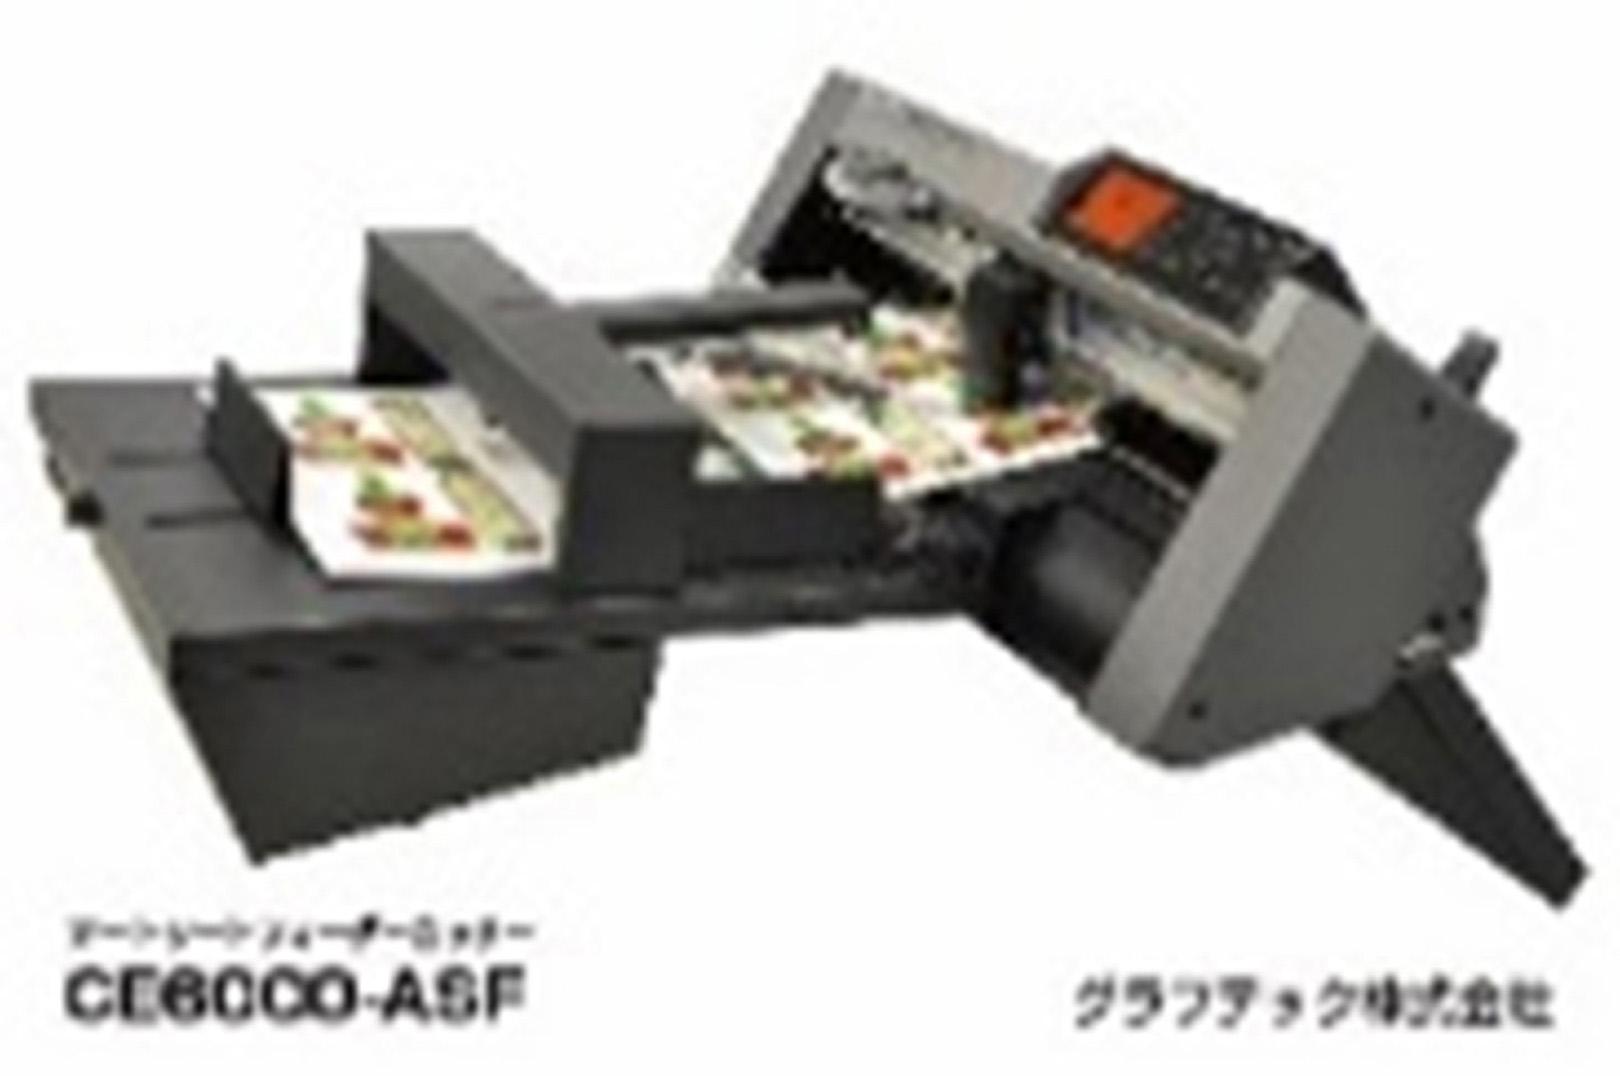 CE6000-ASF